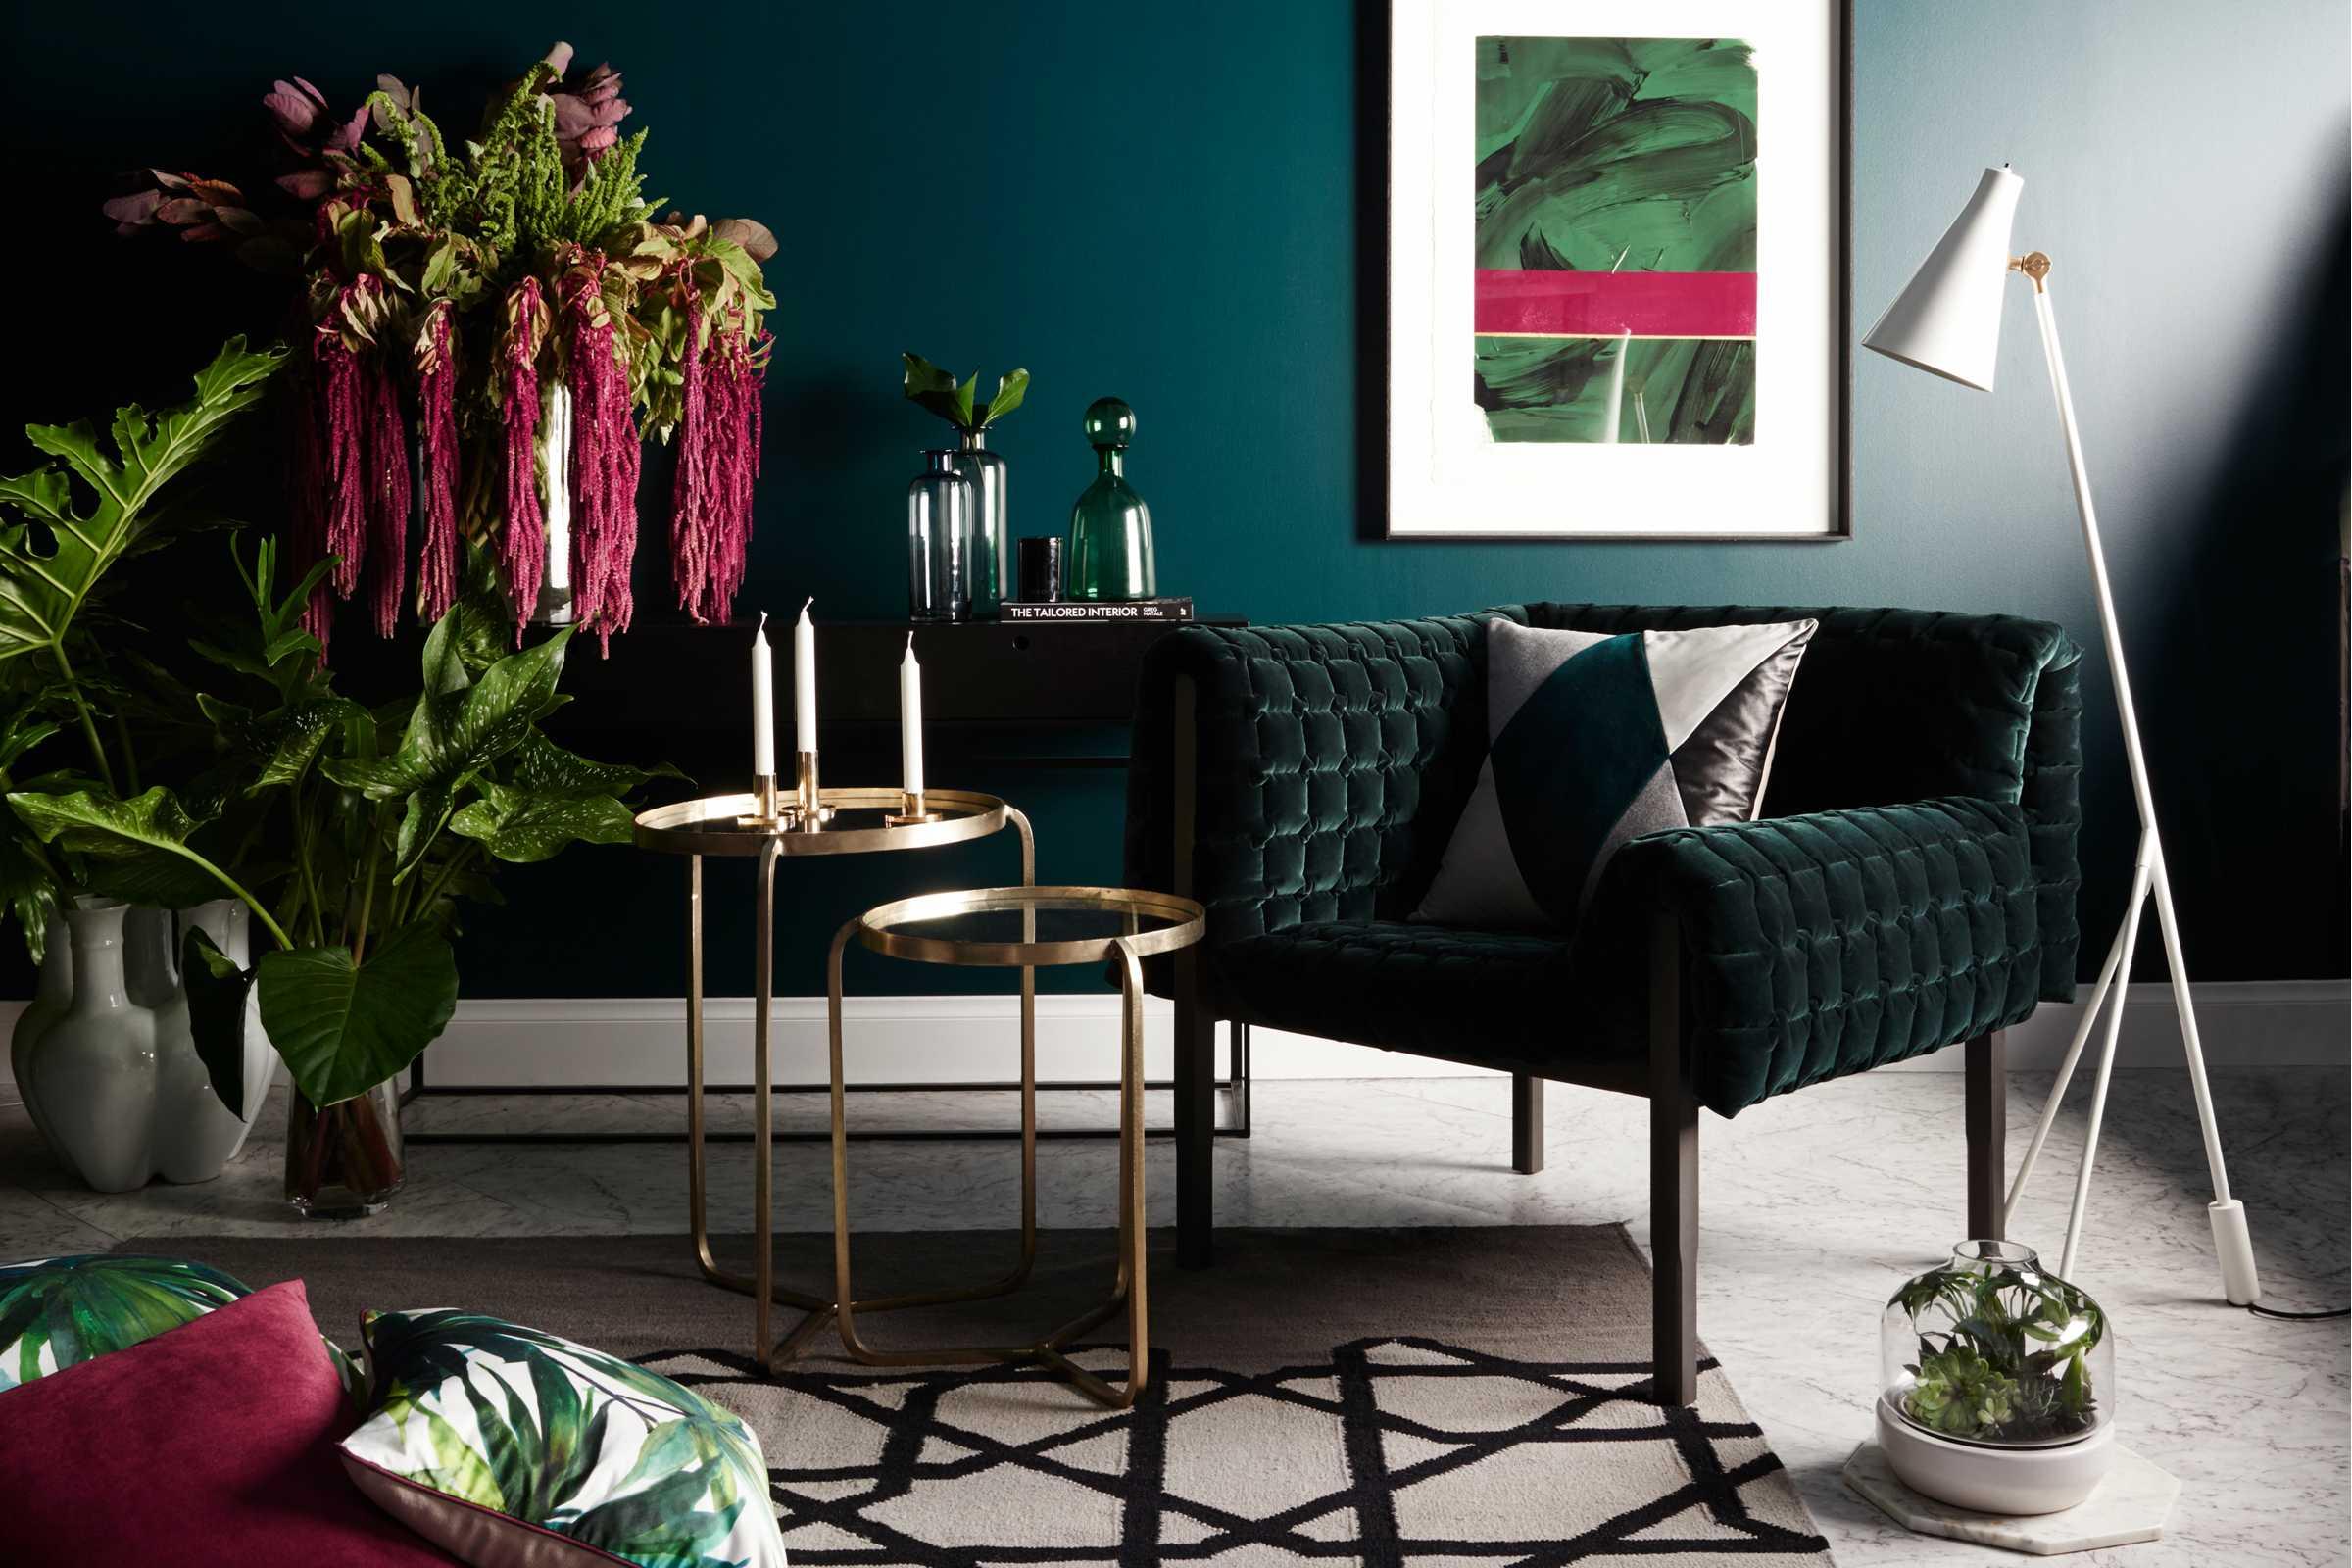 Top 5 Interior Design Trends For 2018